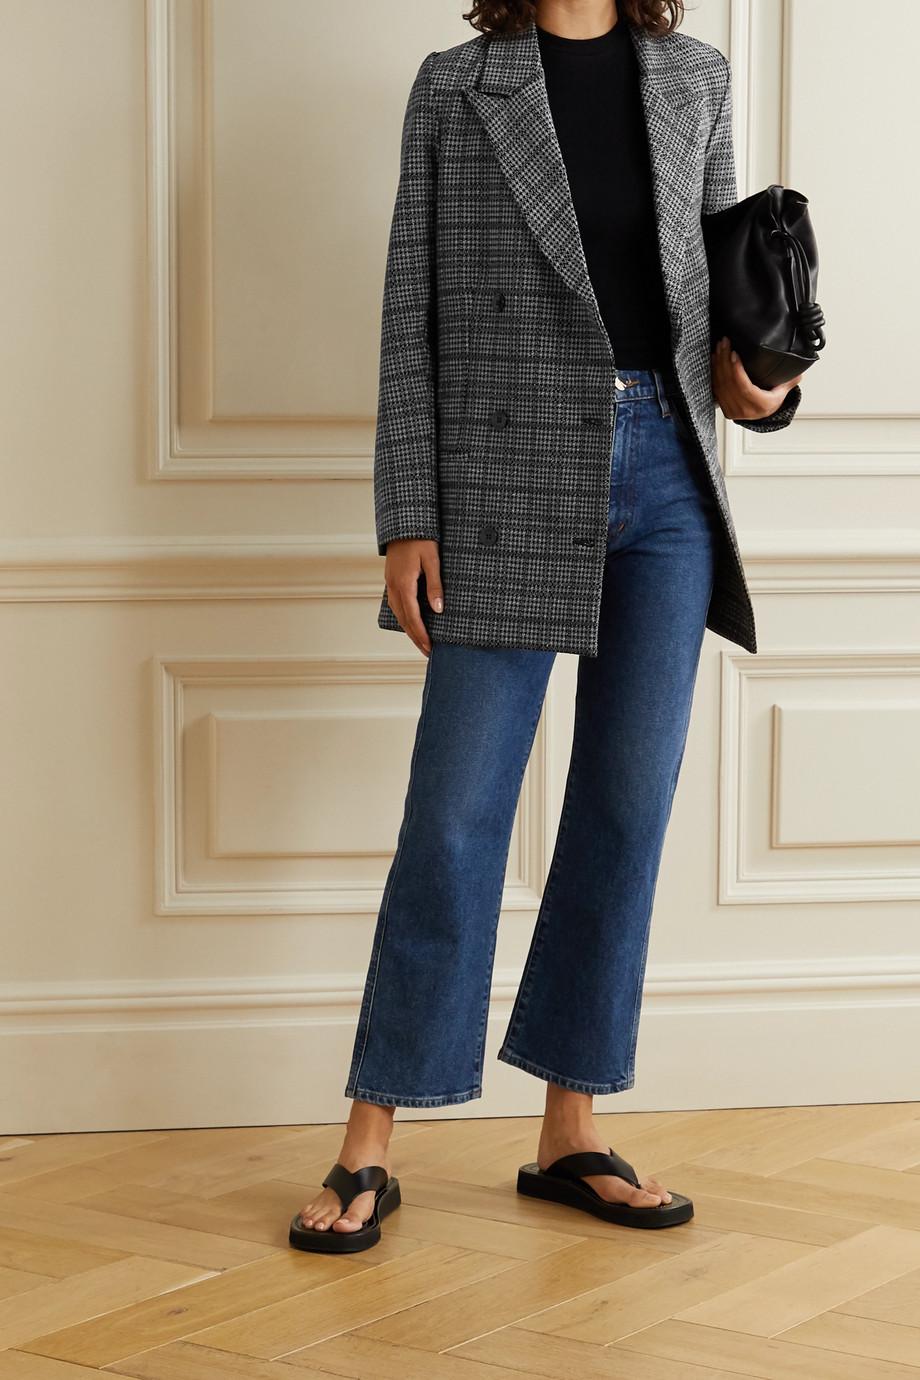 LESET Stili doppelreihiger Blazer aus Webstoff mit Glencheck-Muster